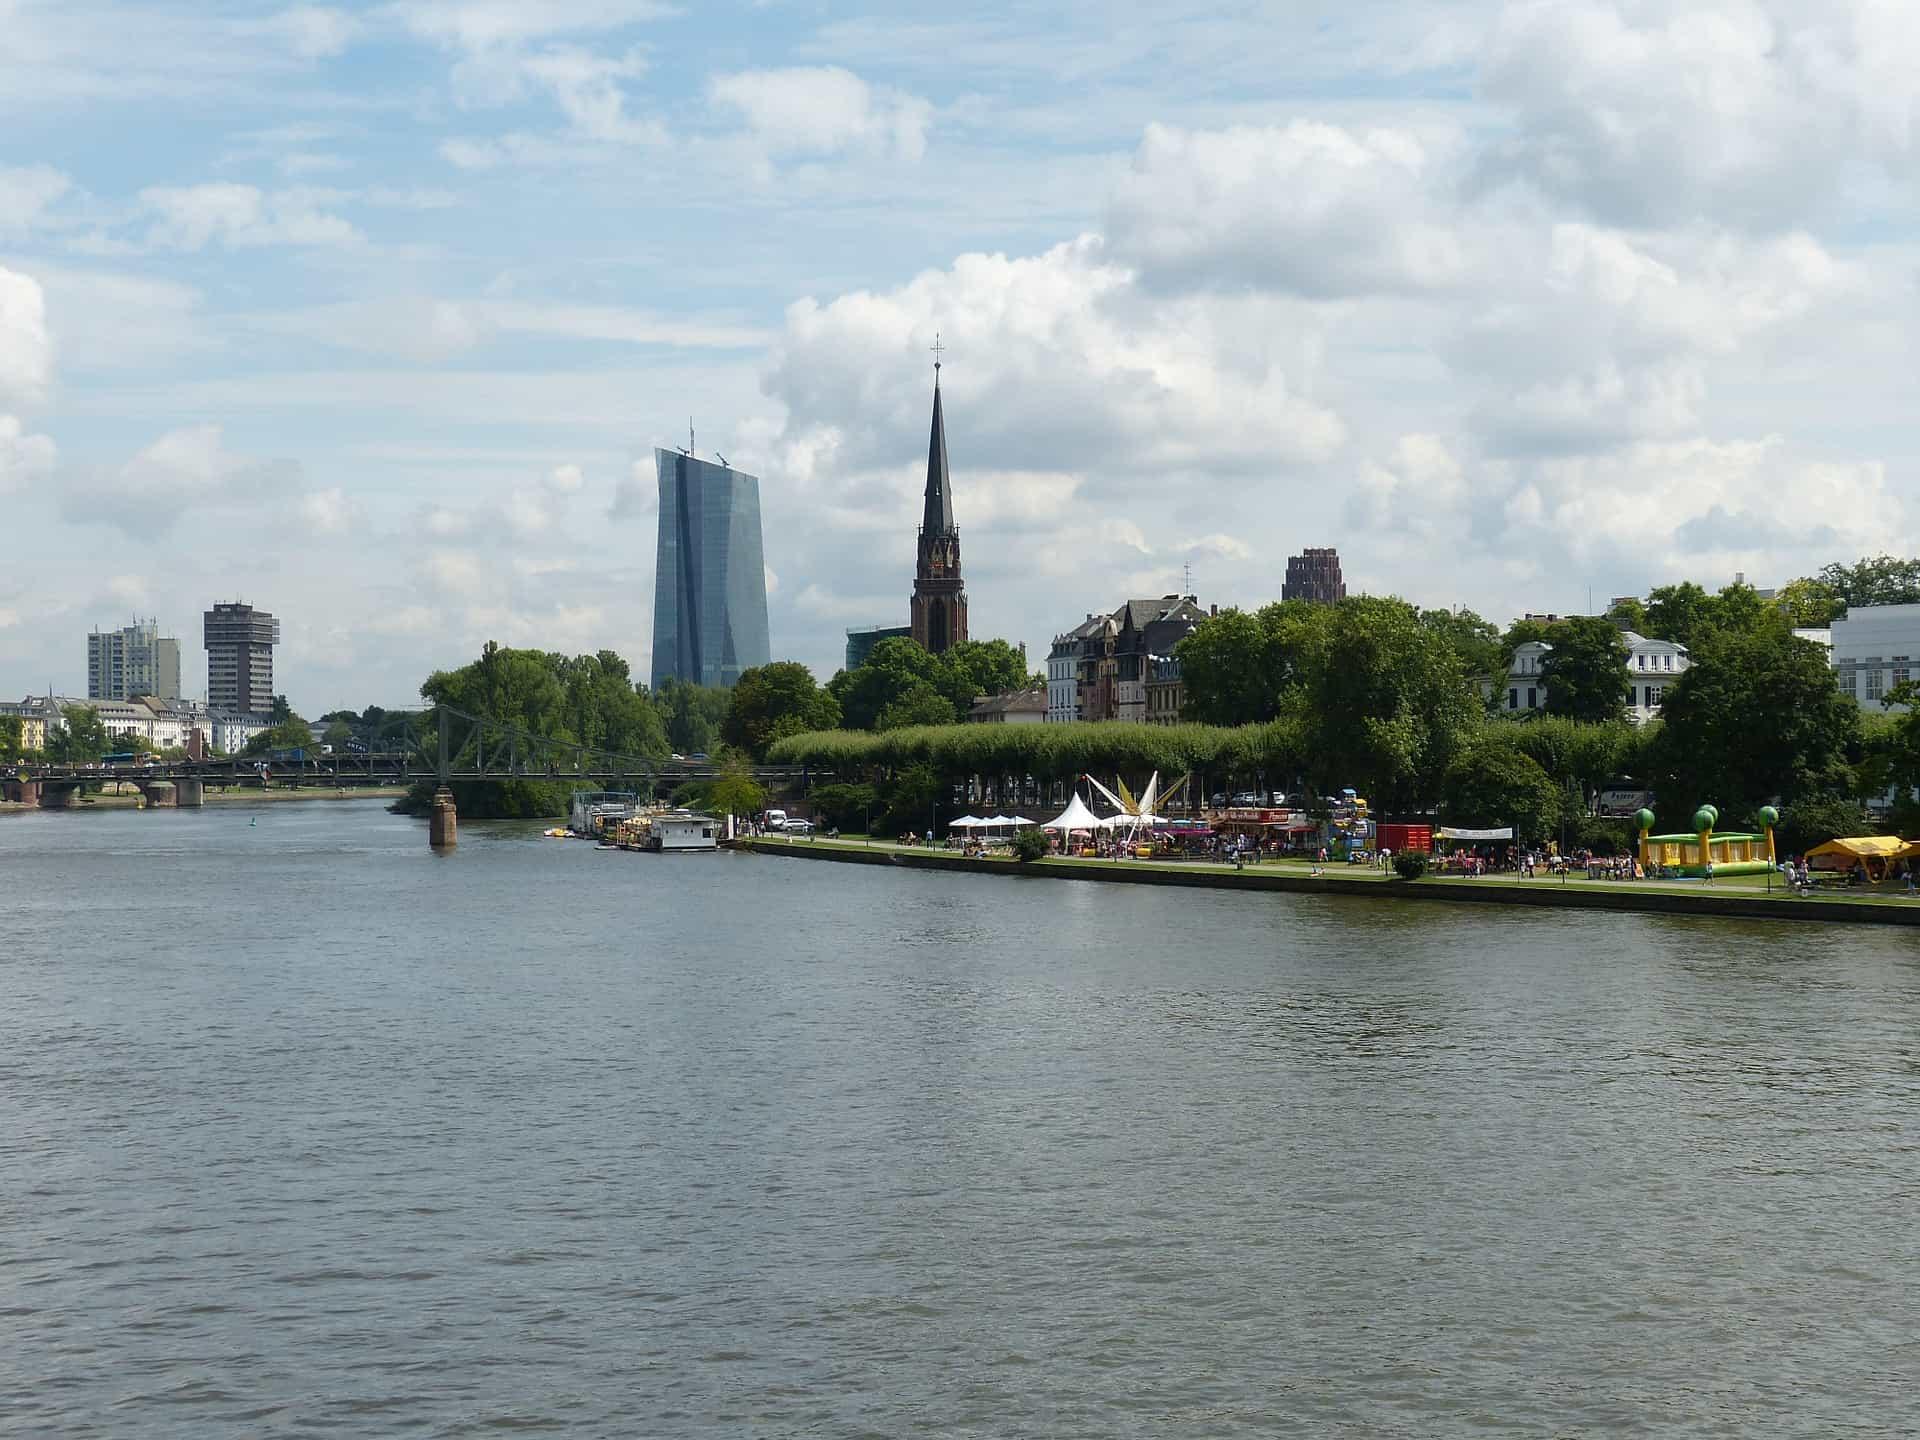 Mainhattan : Frankfurt Städtereise 3 Tage nur 54,99€   Wellness 1